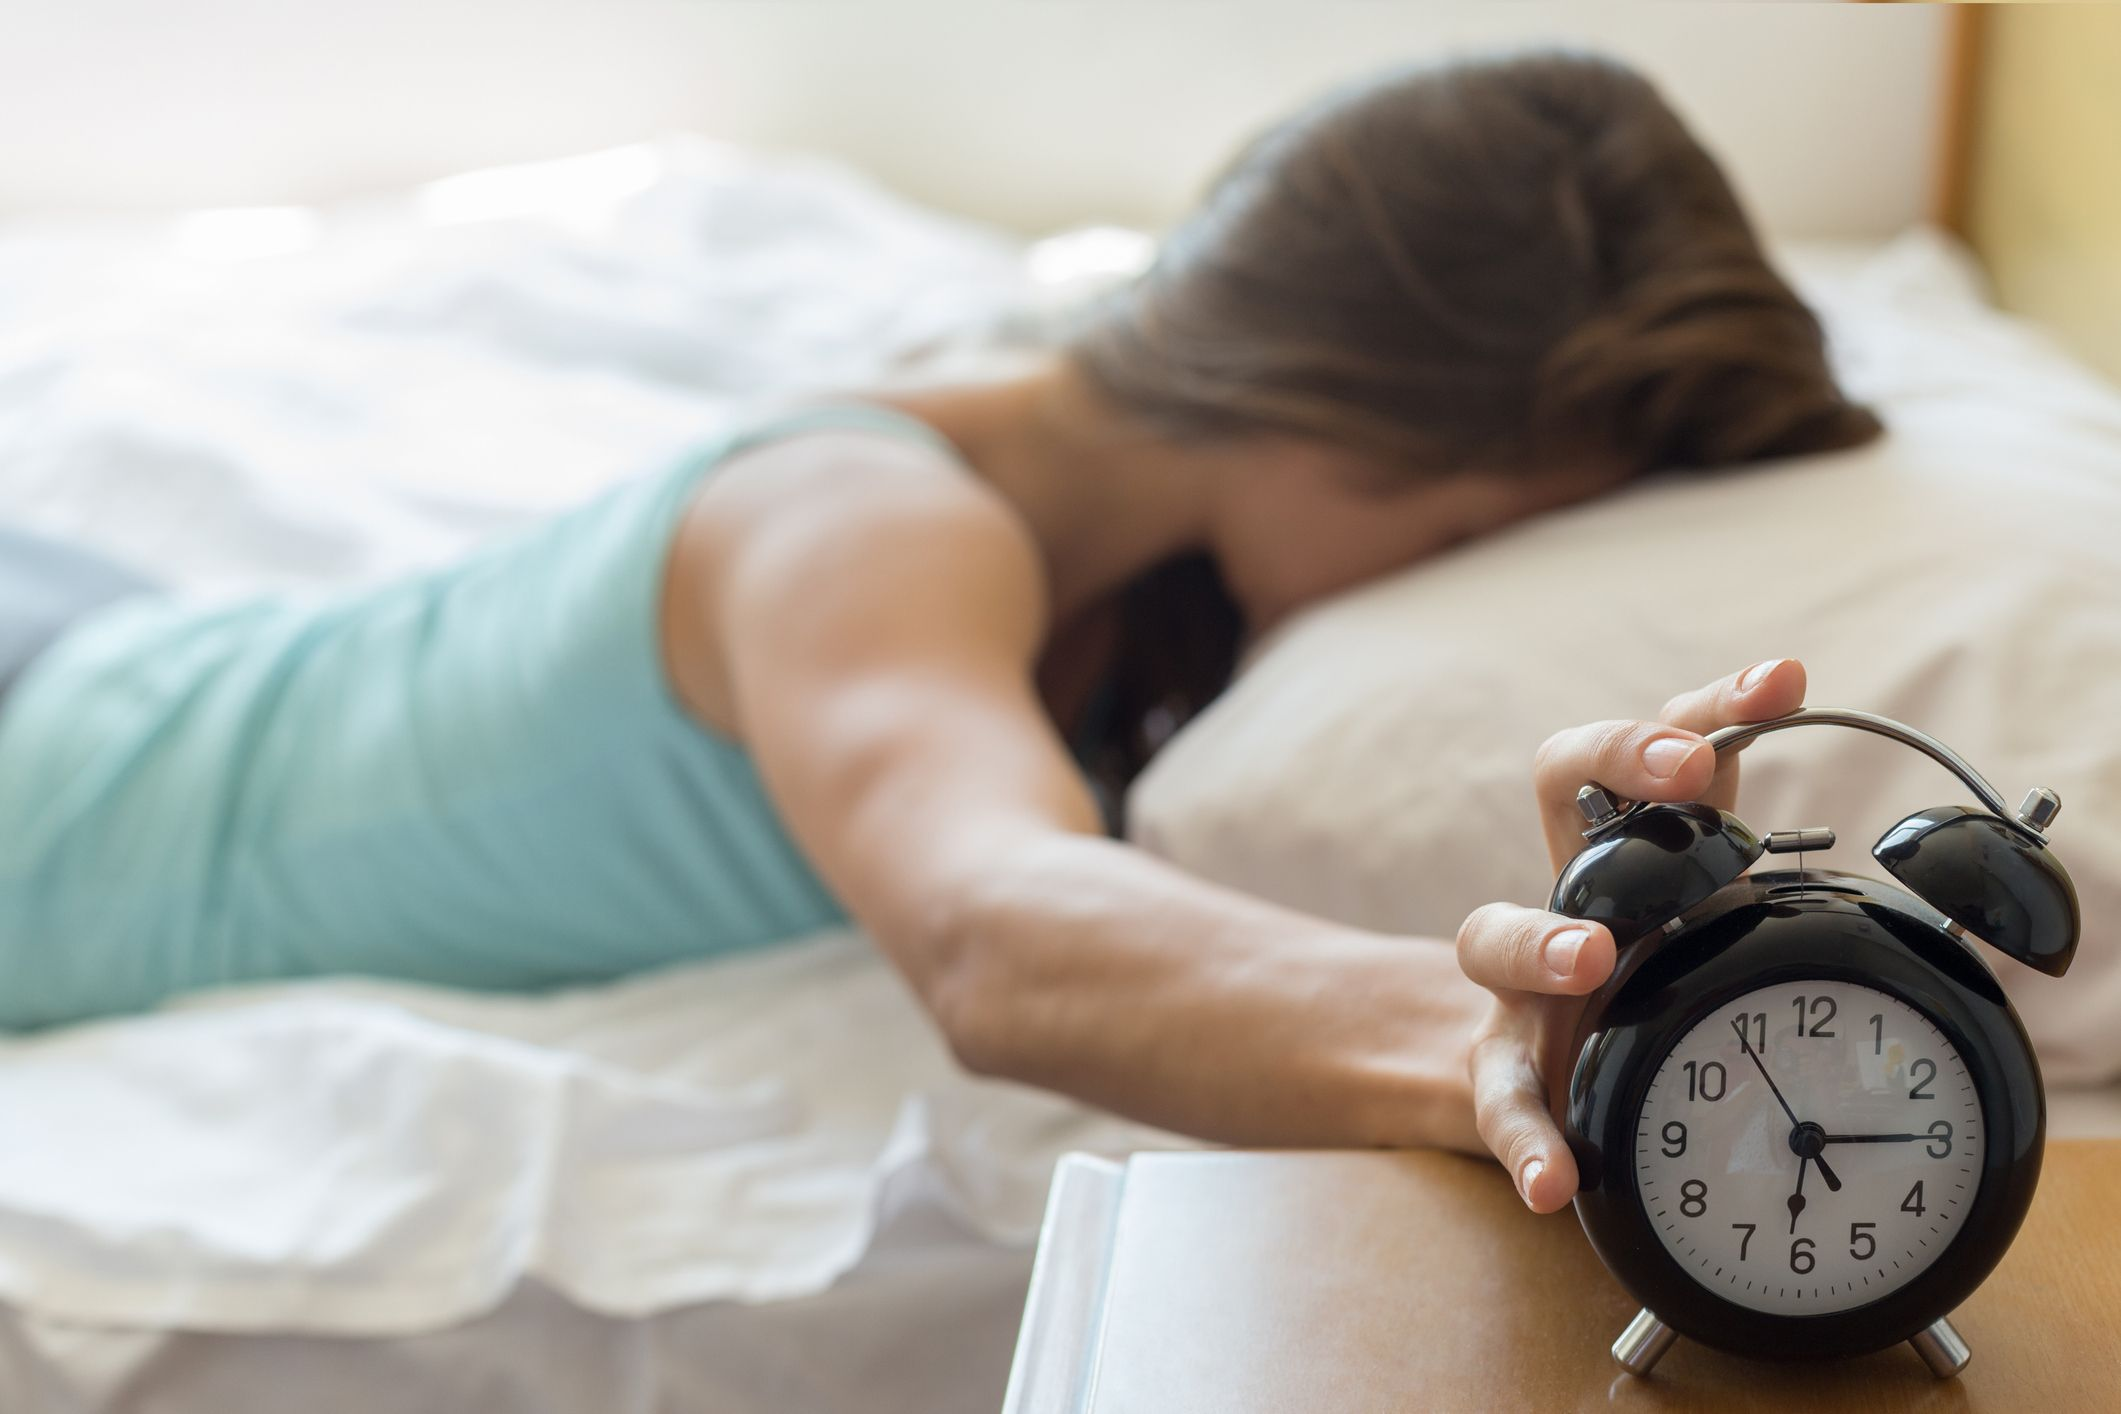 10 Best Loud Alarm Clocks For Heavy Sleepers 2021